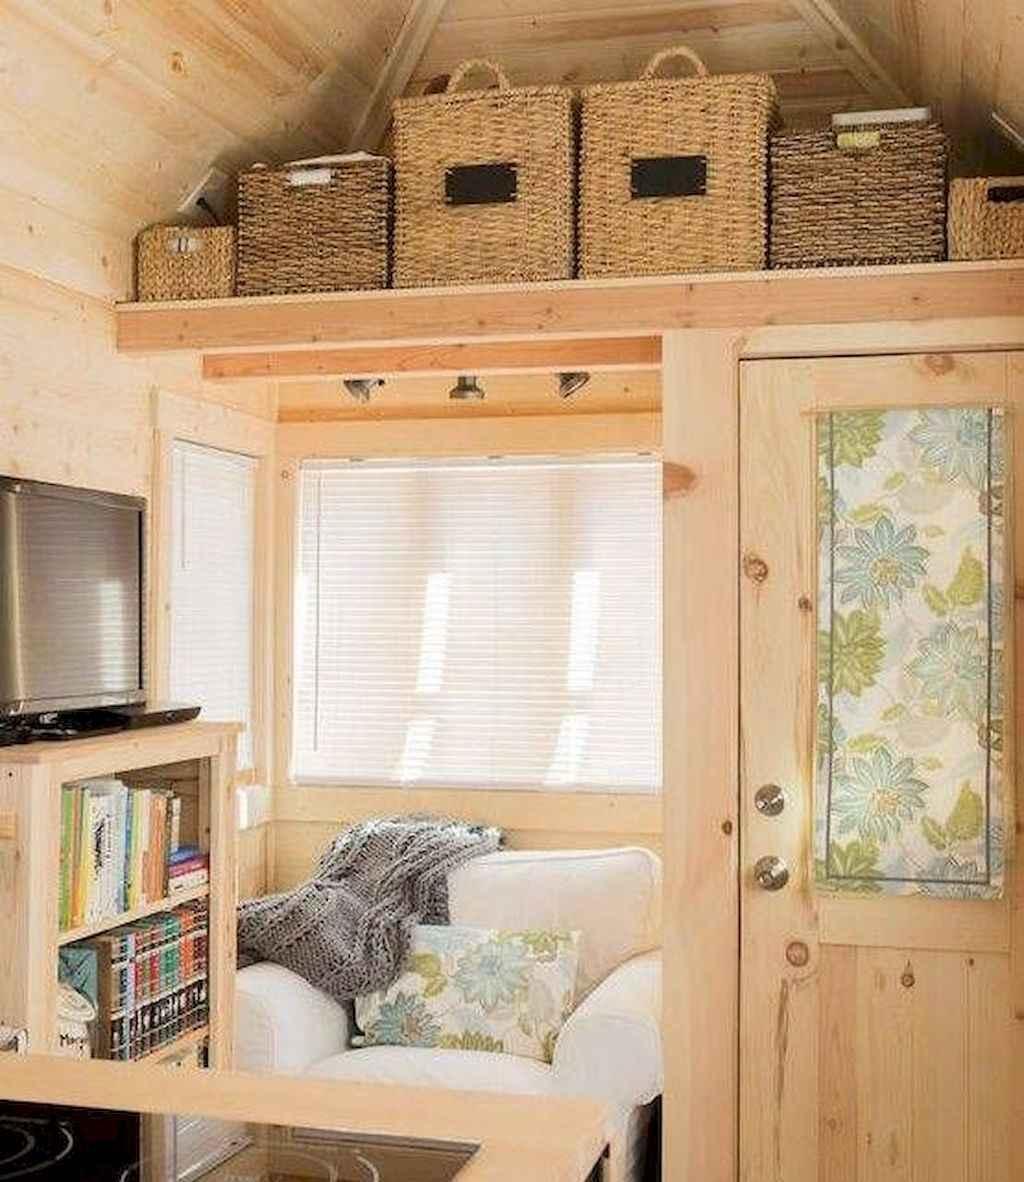 30 Space Saving Tiny House Storage Organization and Tips Ideas